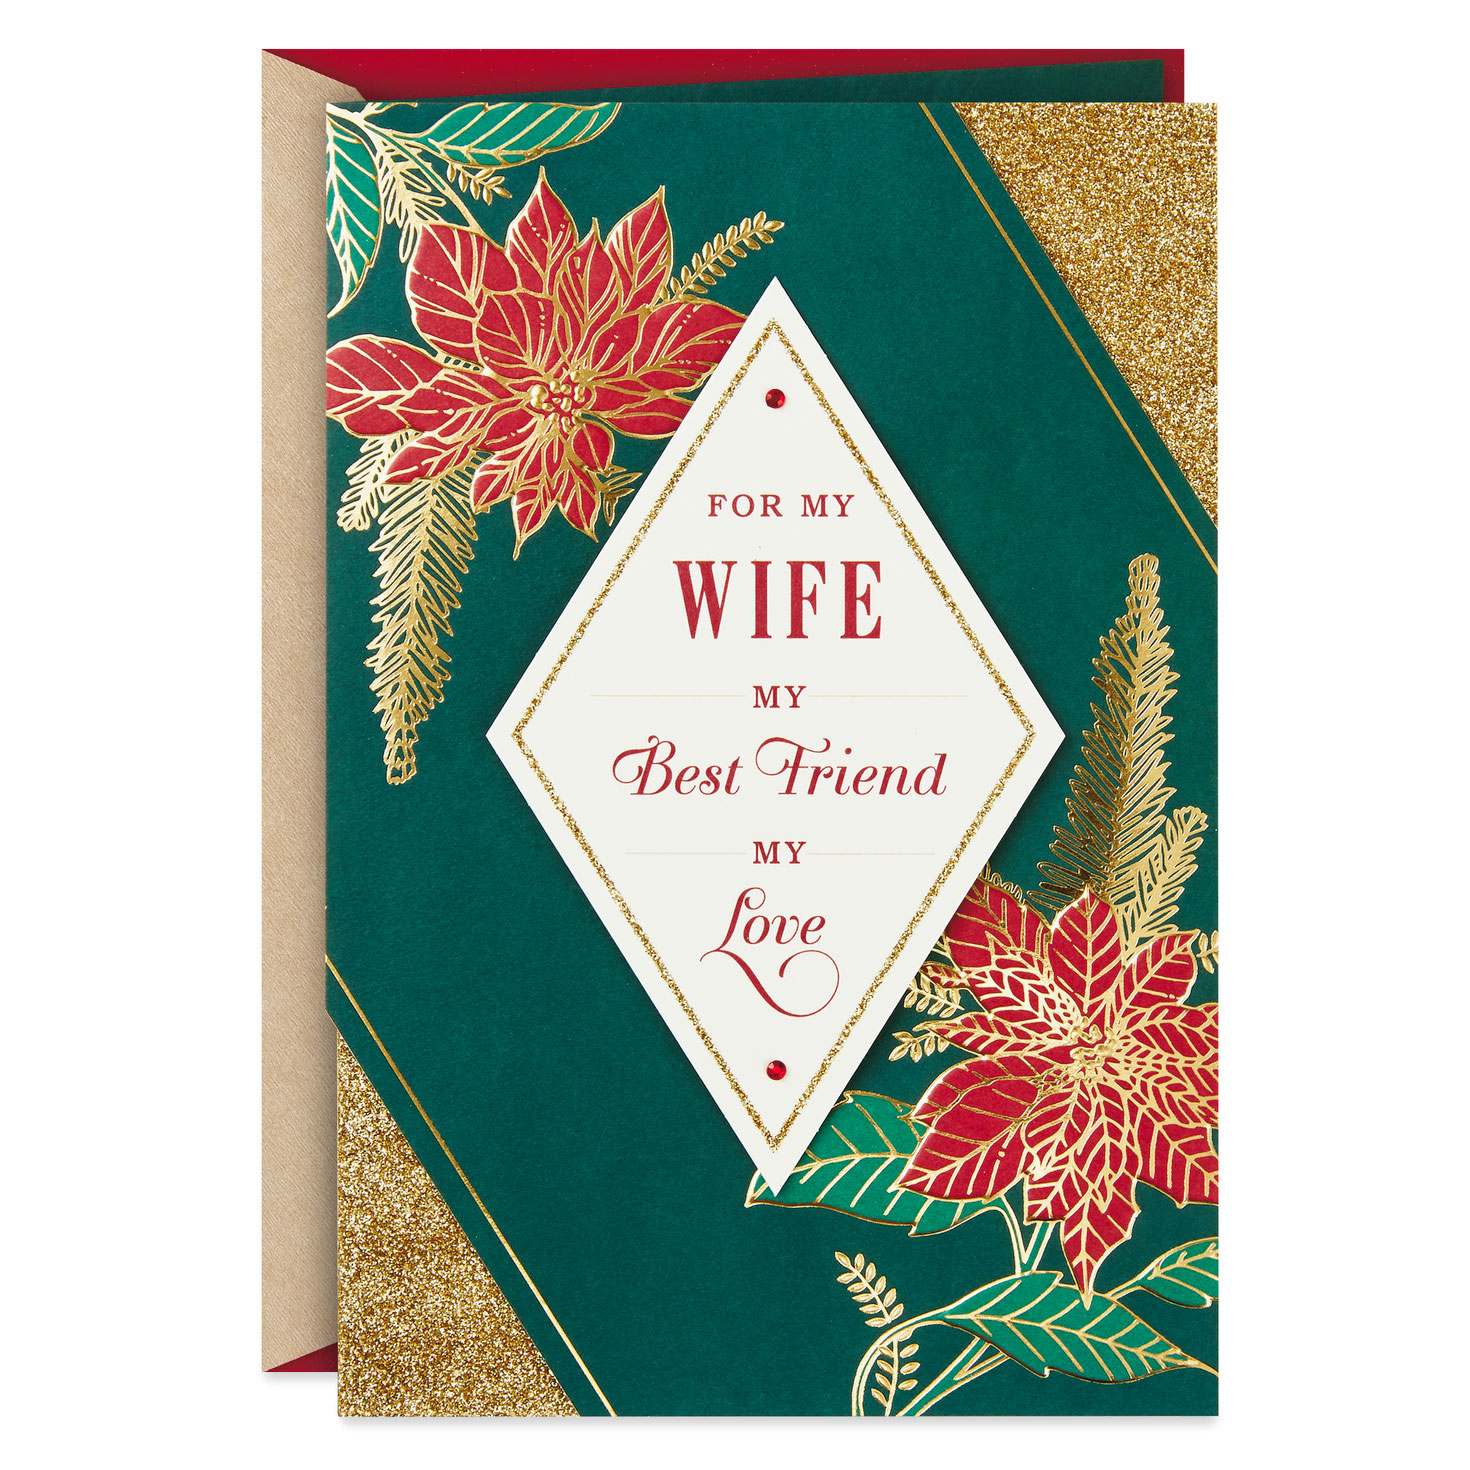 my wife my best friend my love christmas card  greeting